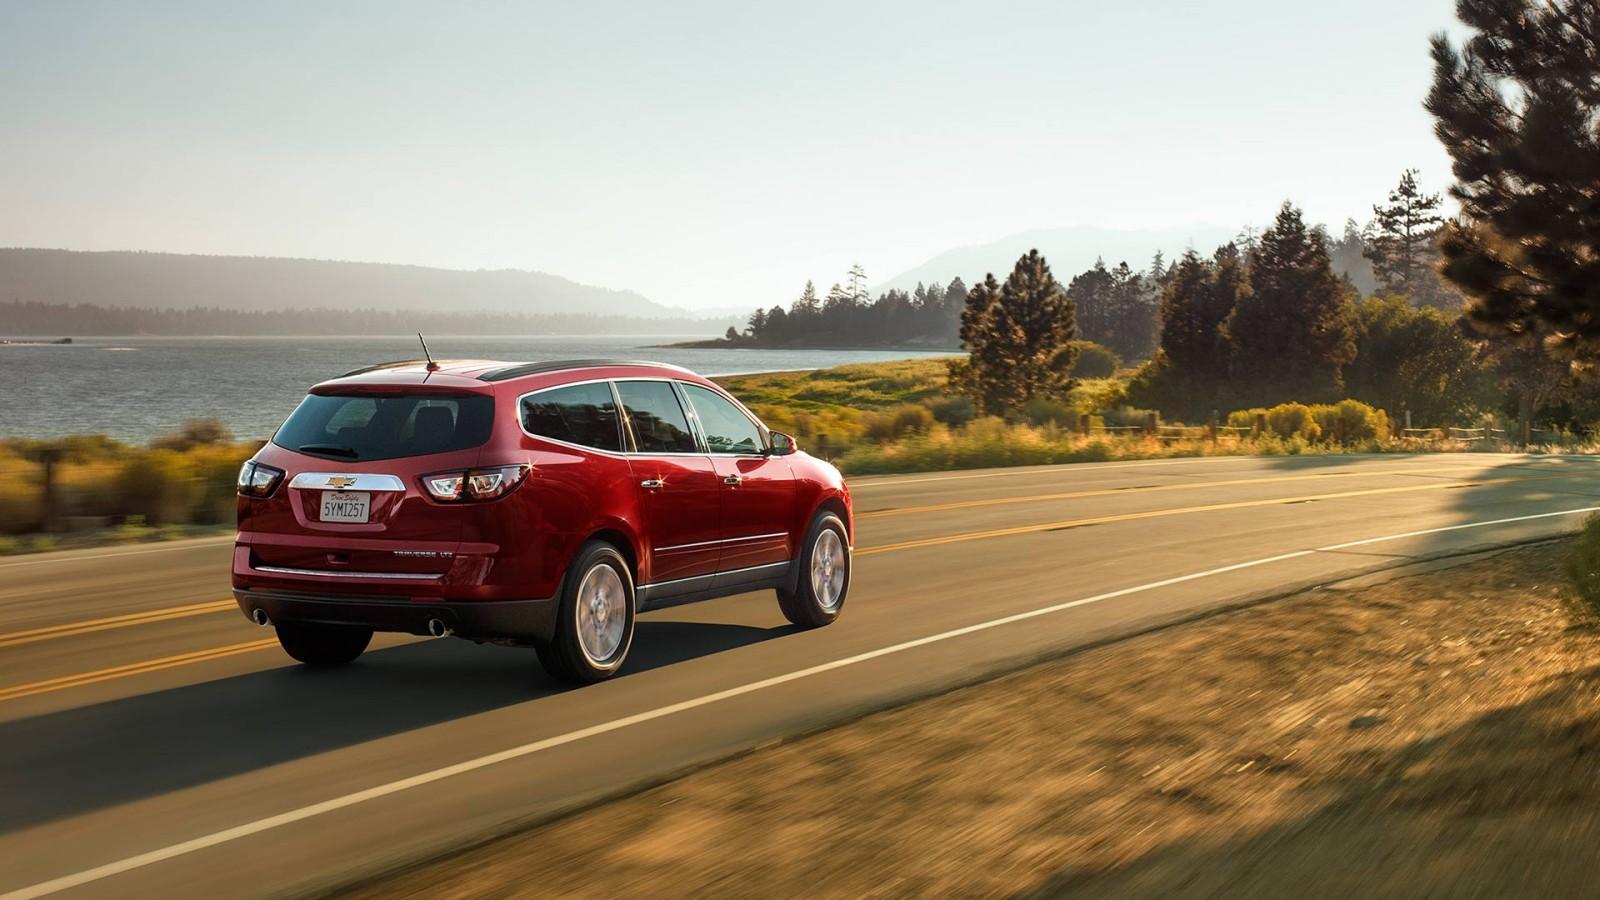 New Chevrolet Traverse Exterior main image